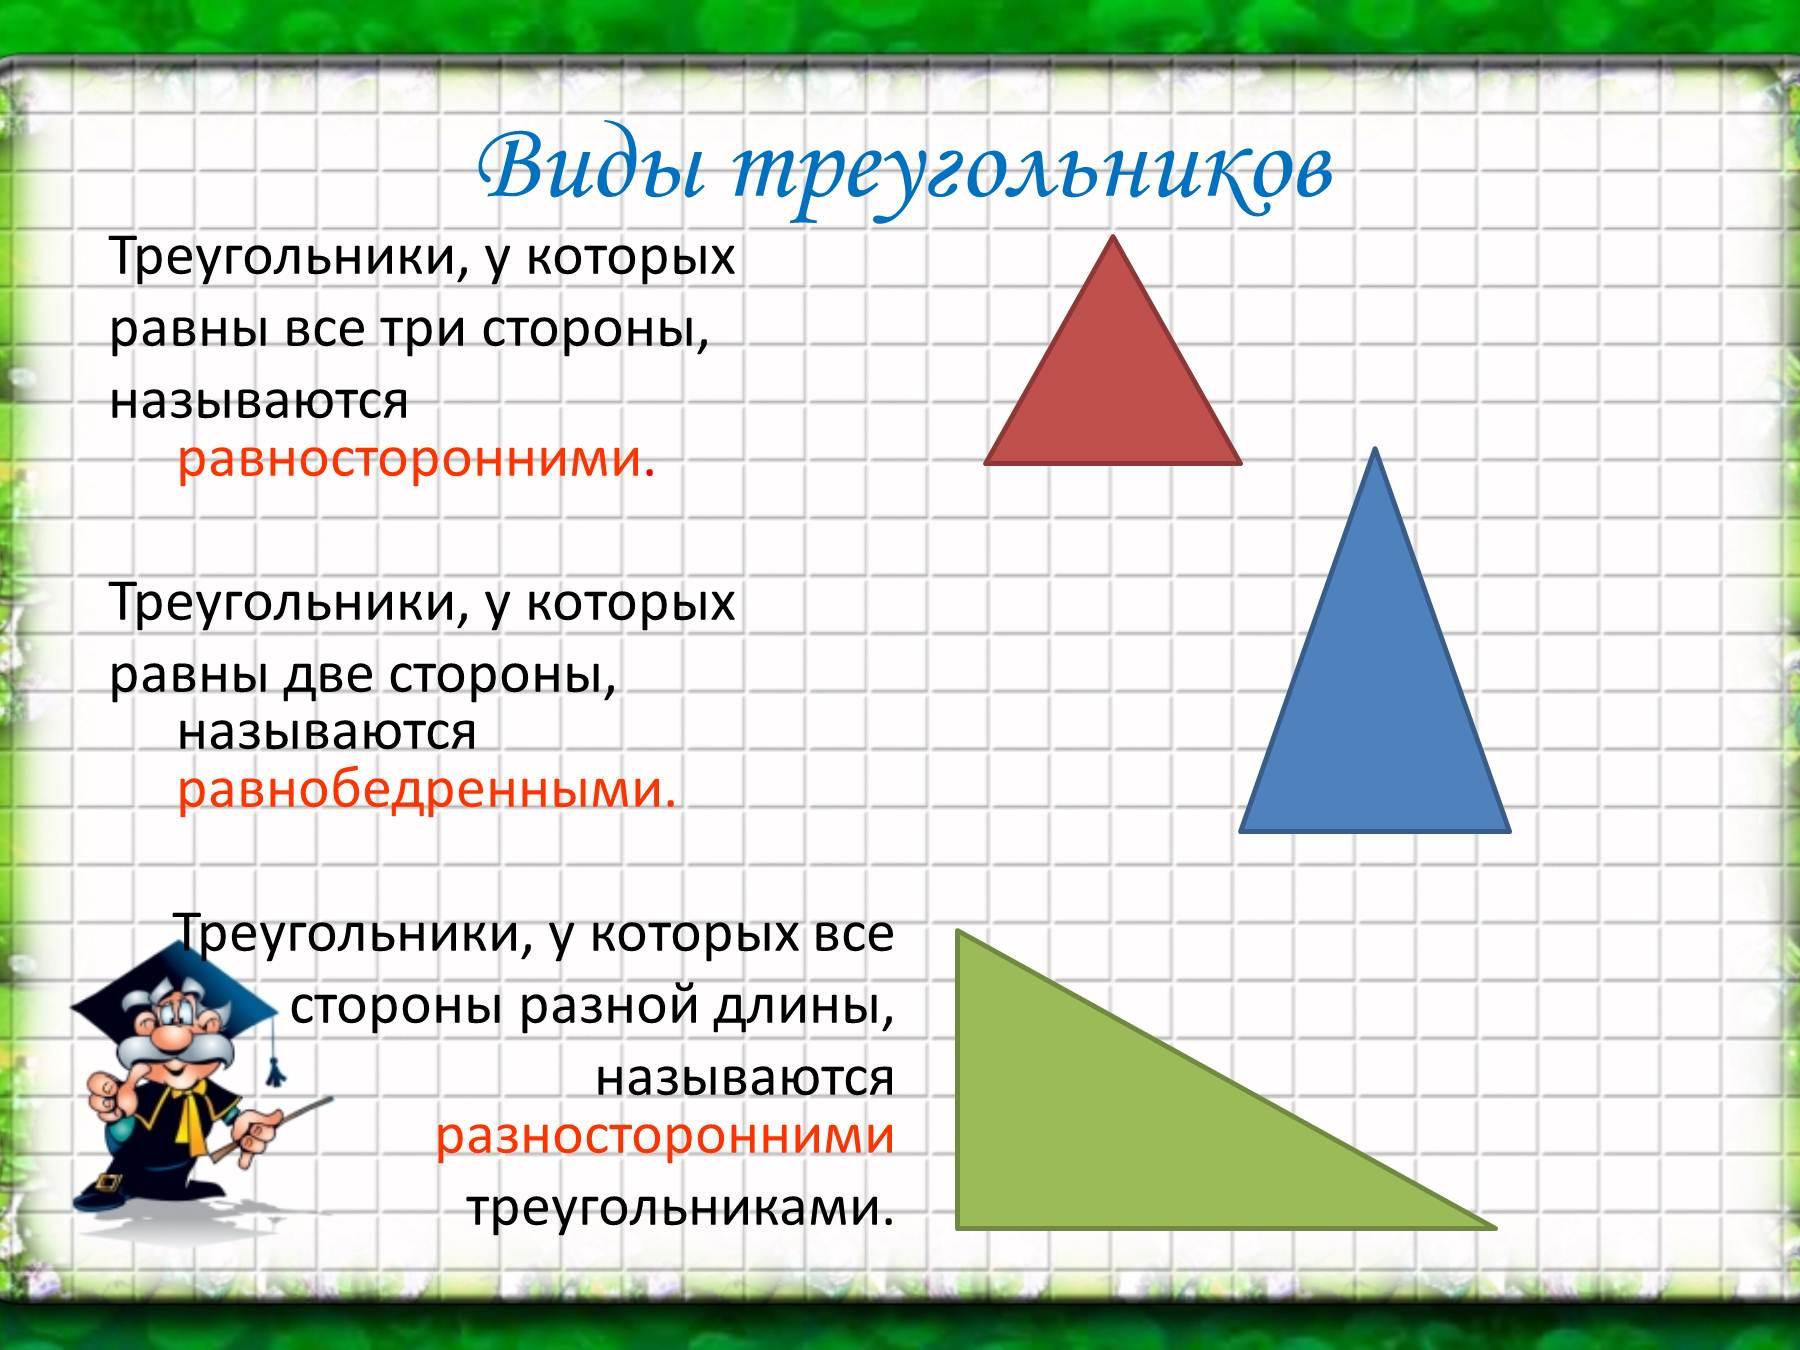 треугольники разного вида картинки